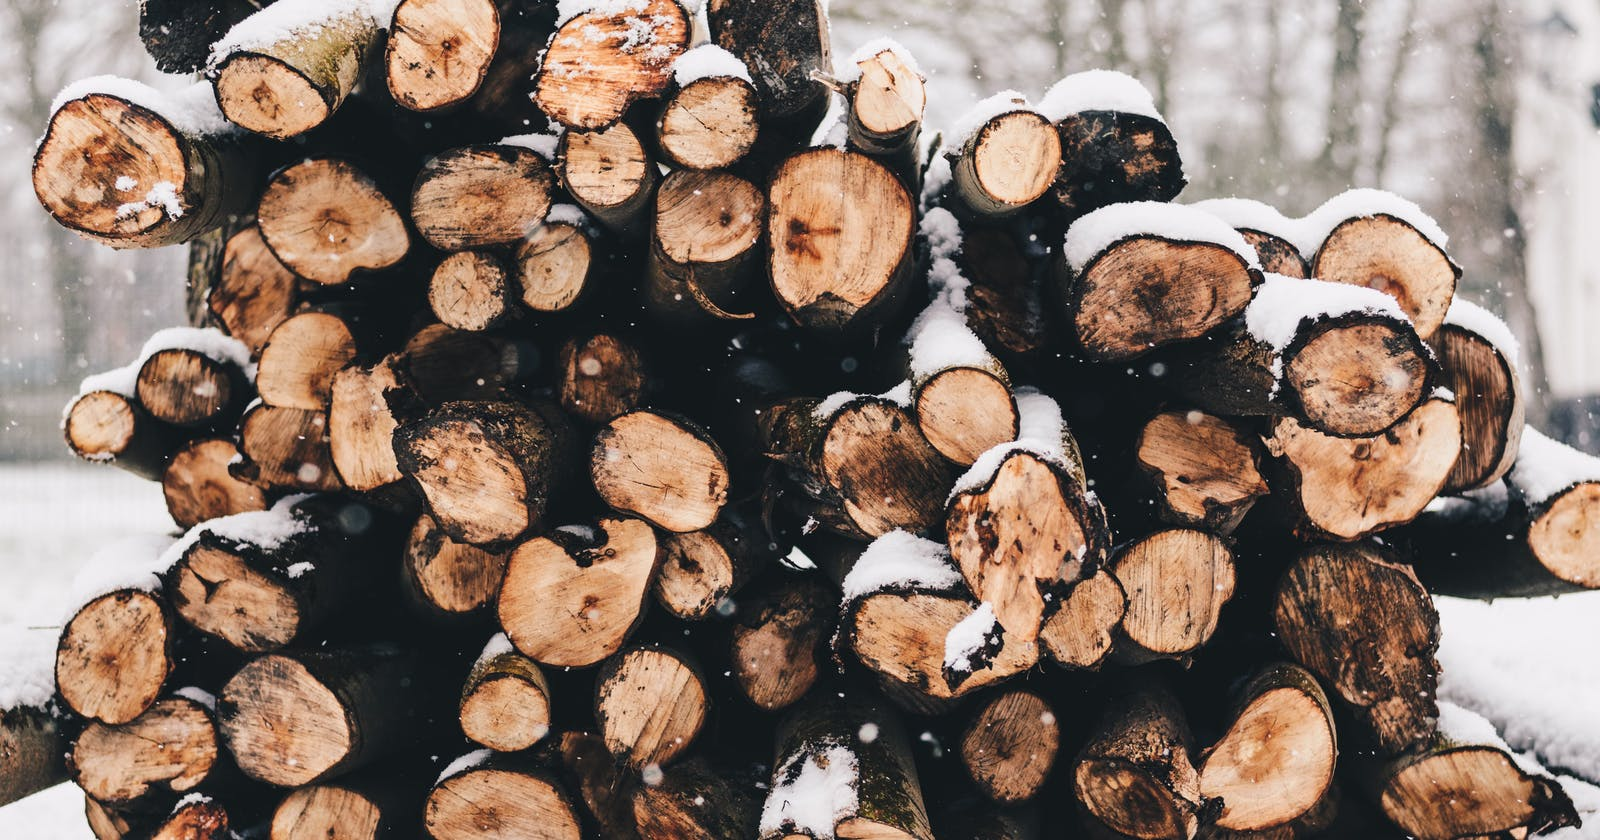 Understanding Sitecore logs – Part 4: Heartbeat, Dump Configuration Files and Performance Counters